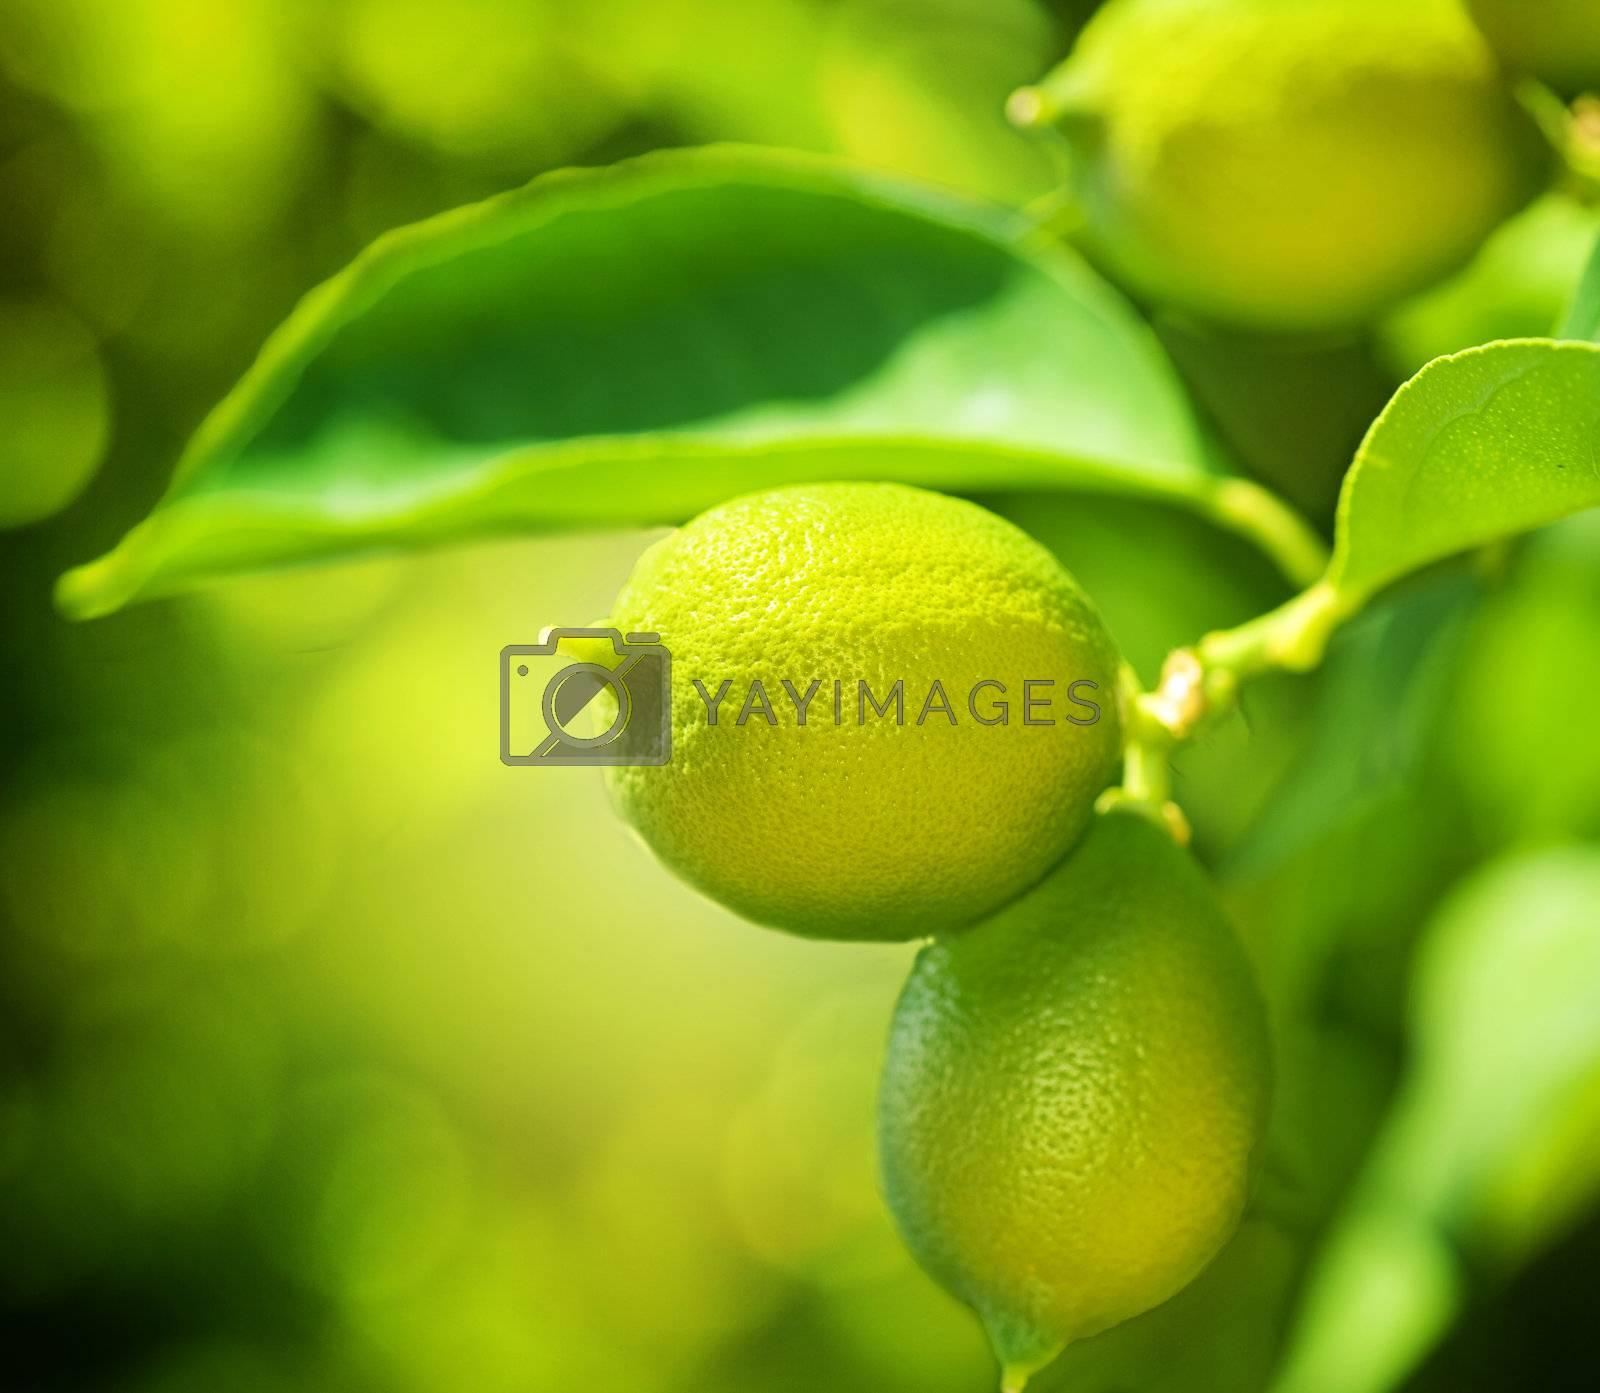 Lemon by Subbotina Anna